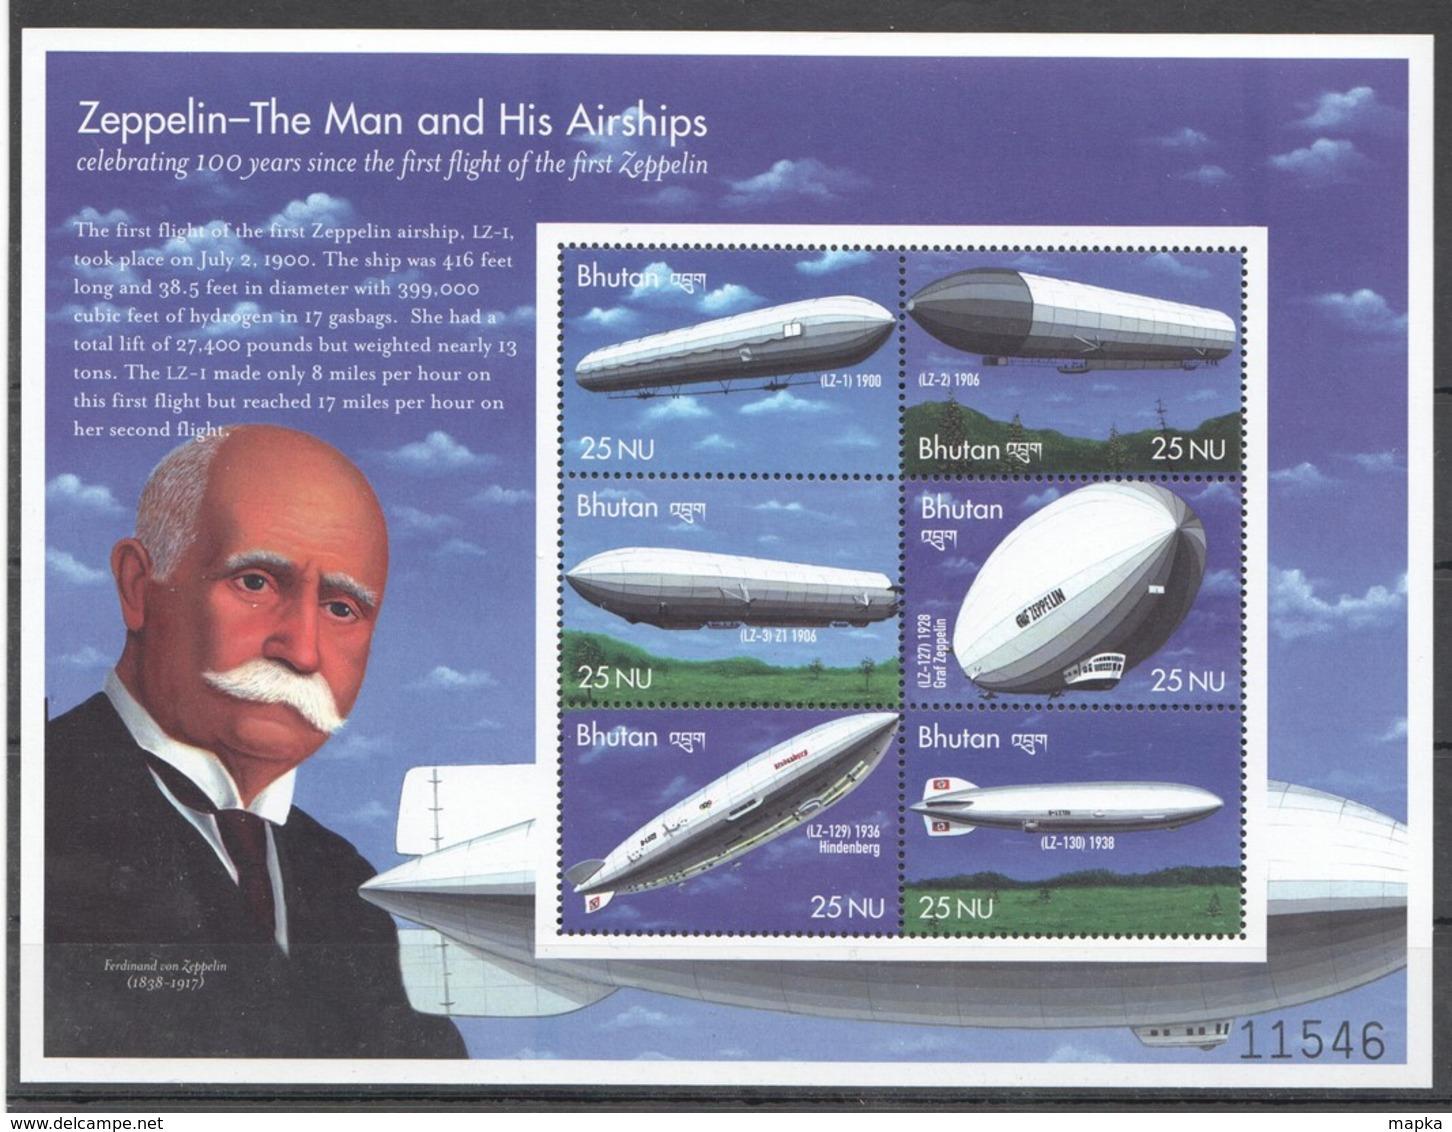 U392 BHUTAN AVIATION ZEPPELIN THE MAN & HIS AIRSHIPS 1KB MNH - Zeppelins